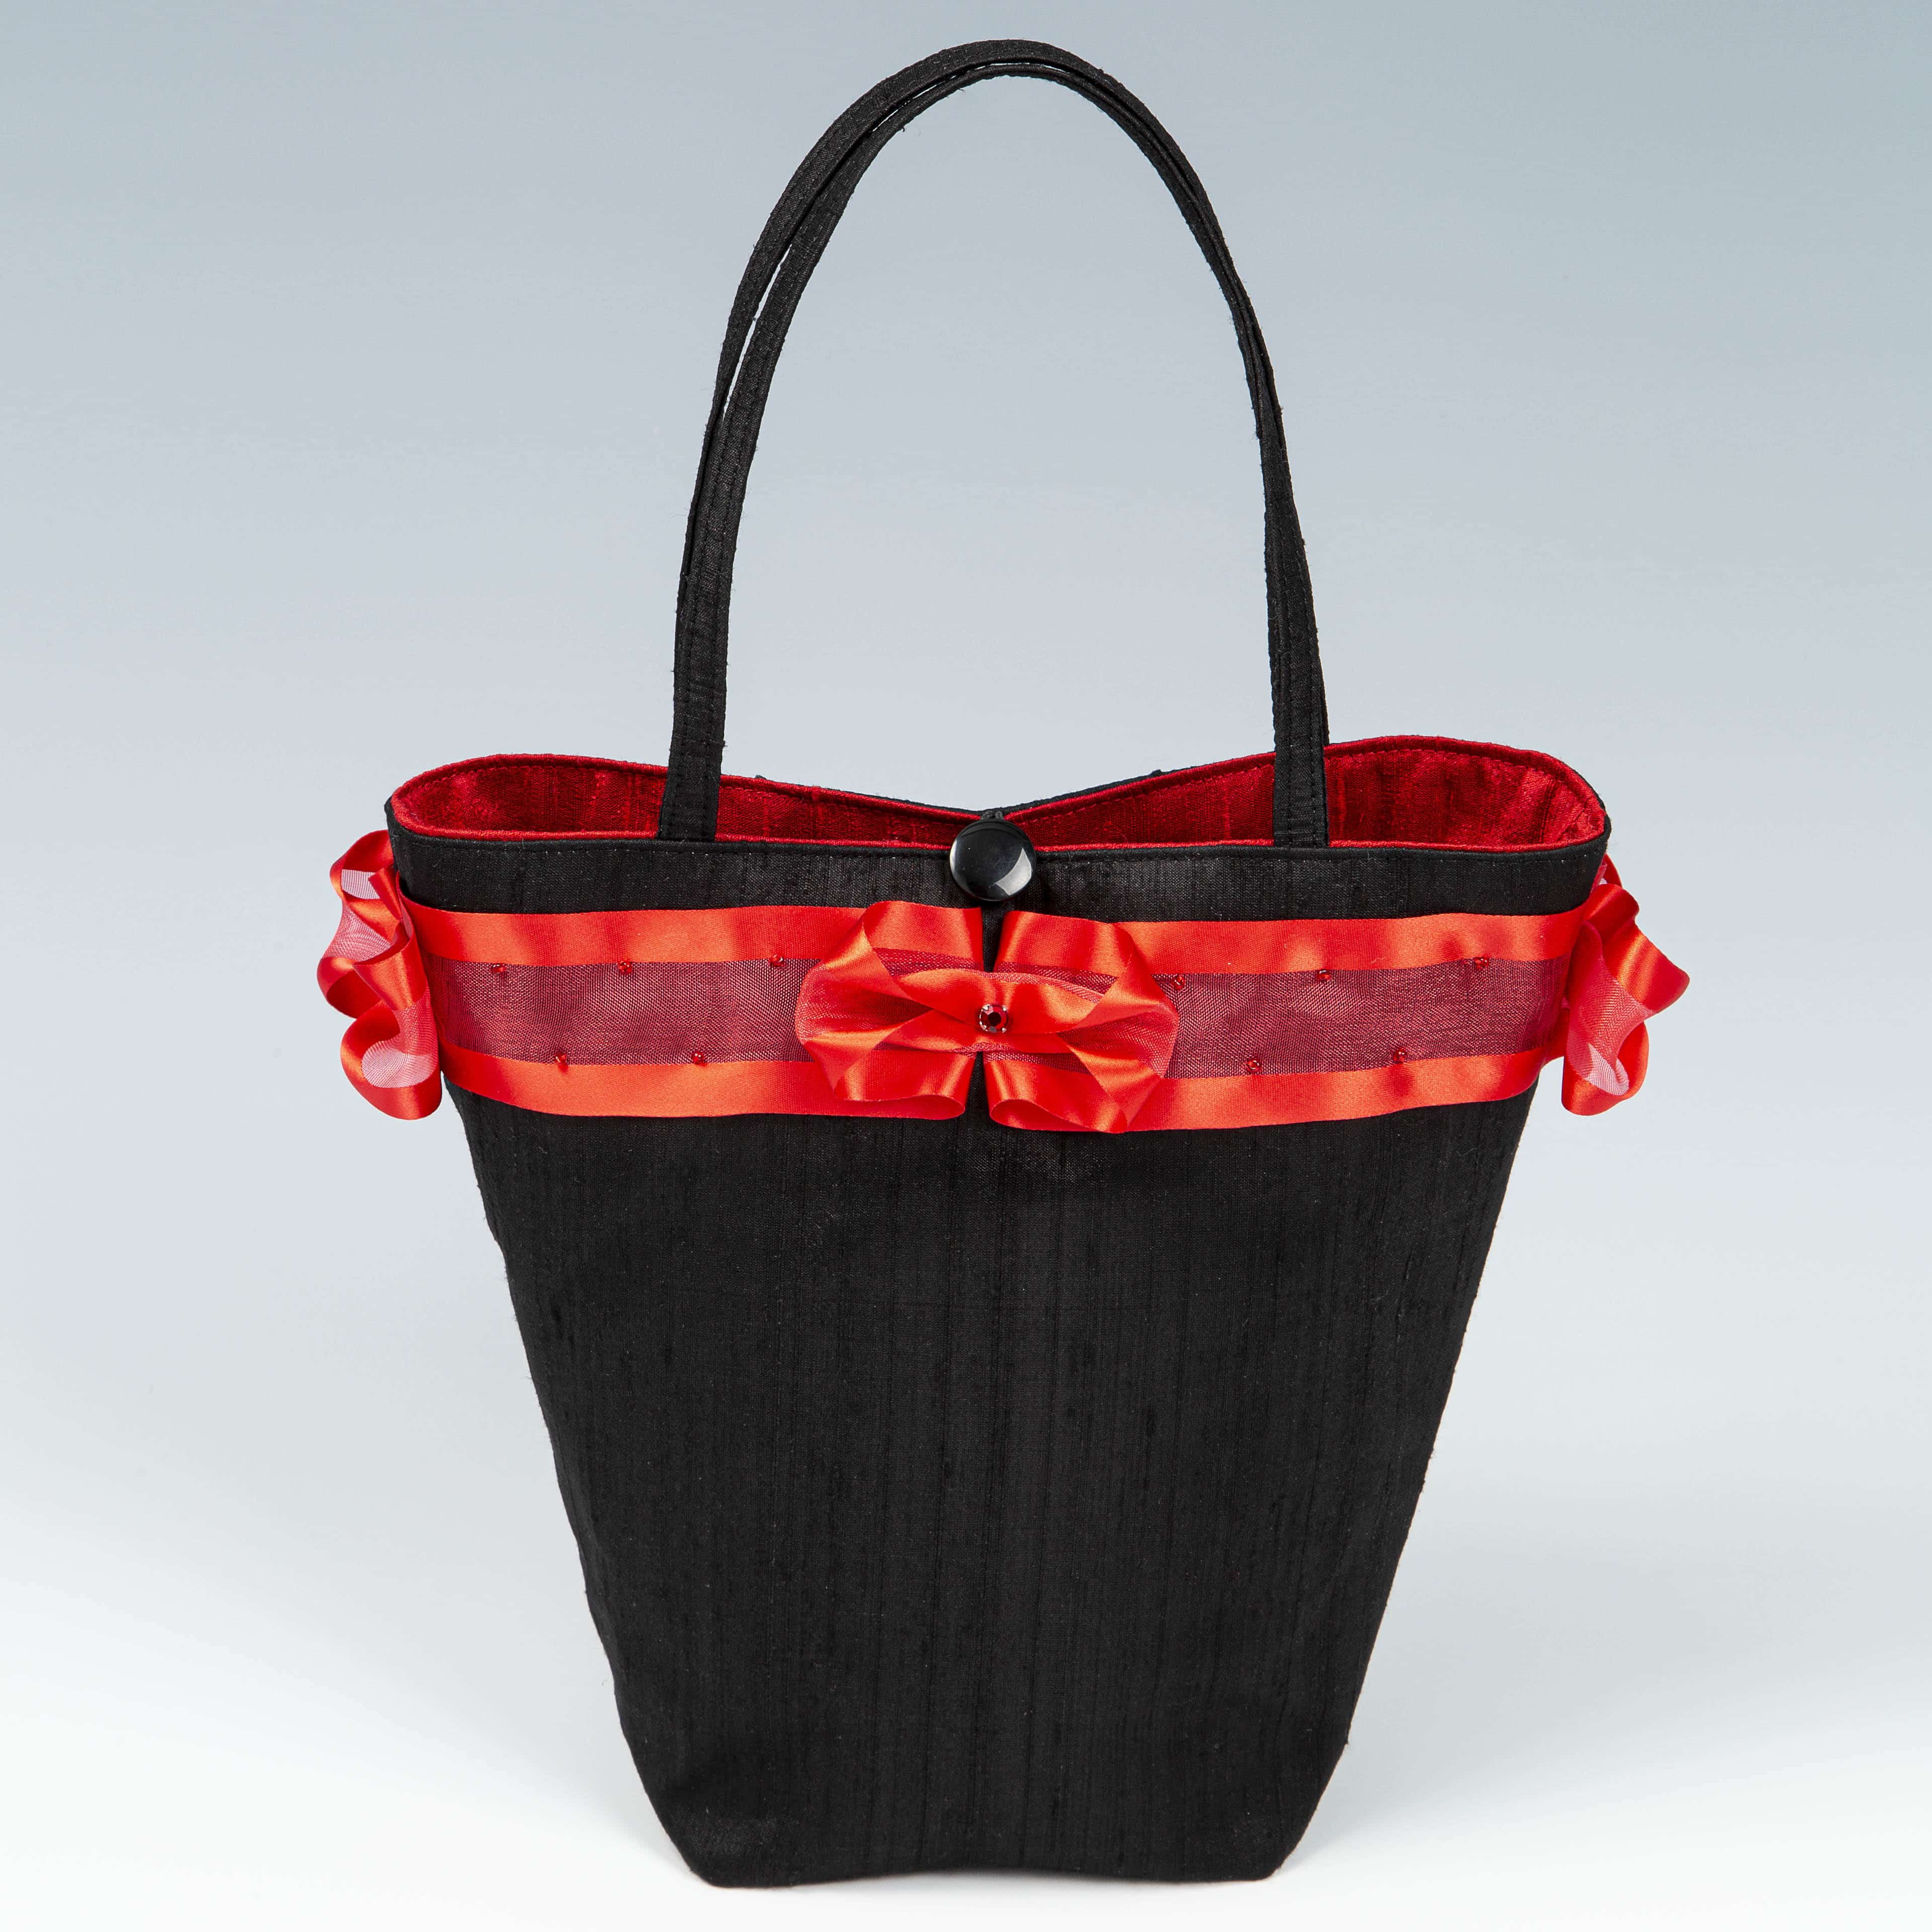 Black and red silk handbag